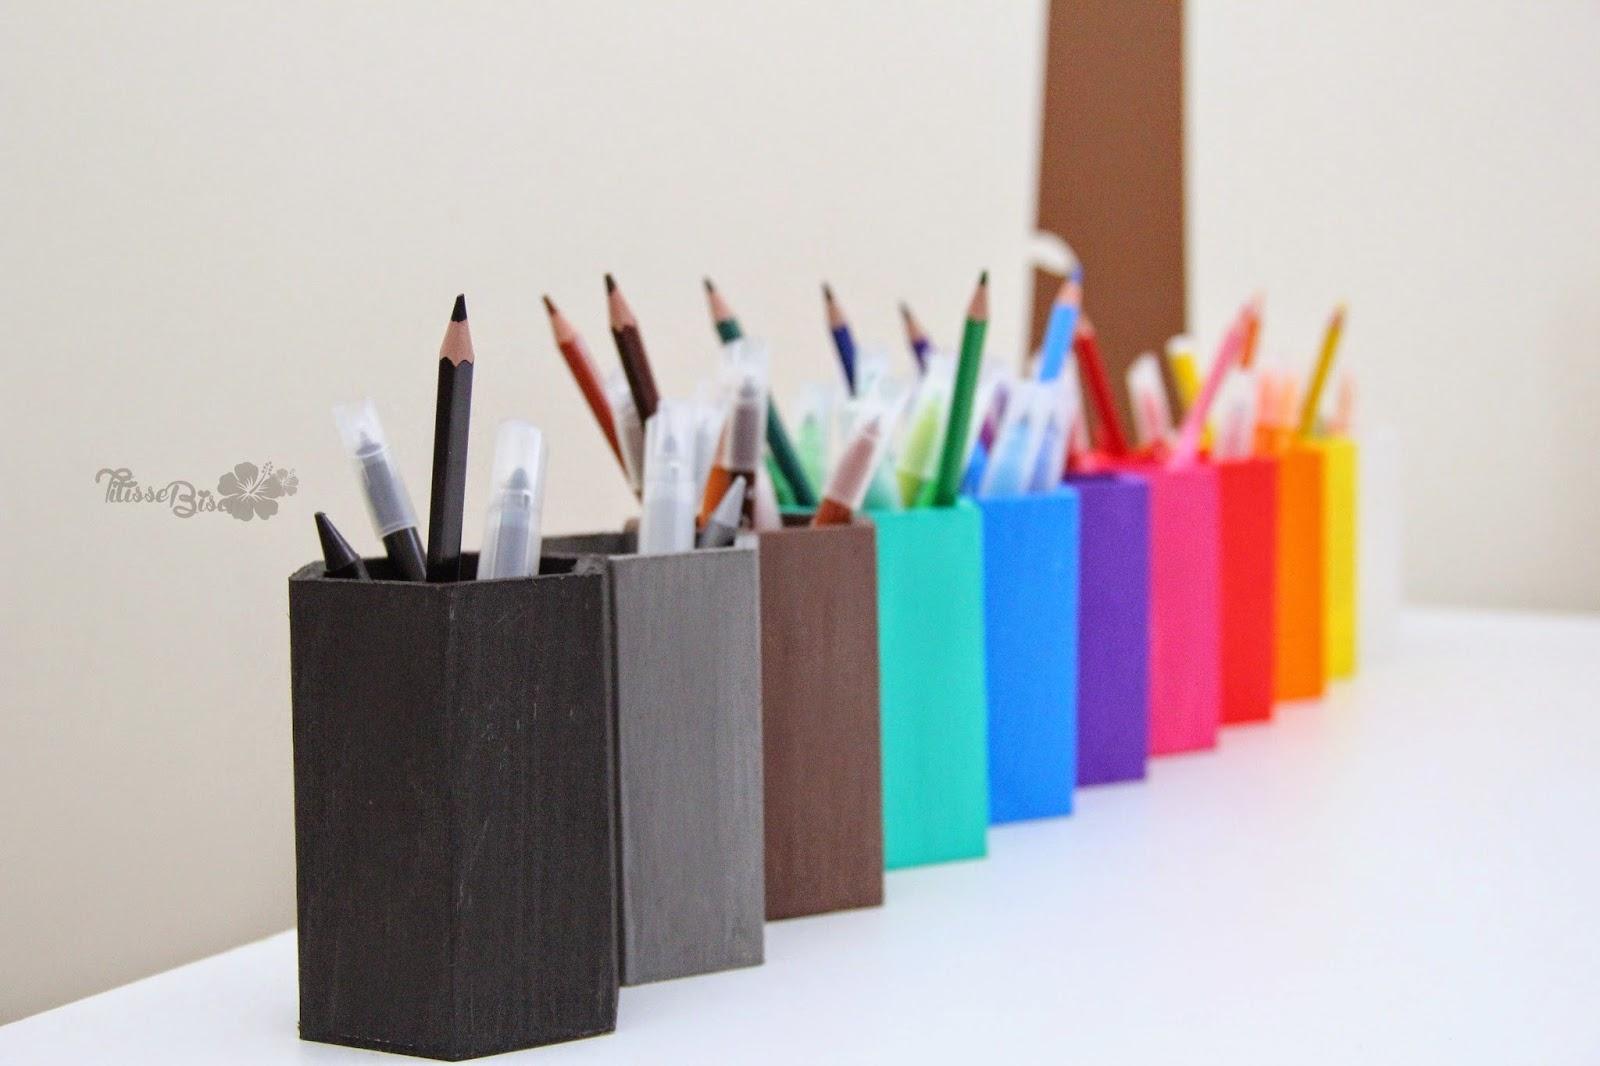 diy montessori les pots crayons titisse biscus. Black Bedroom Furniture Sets. Home Design Ideas